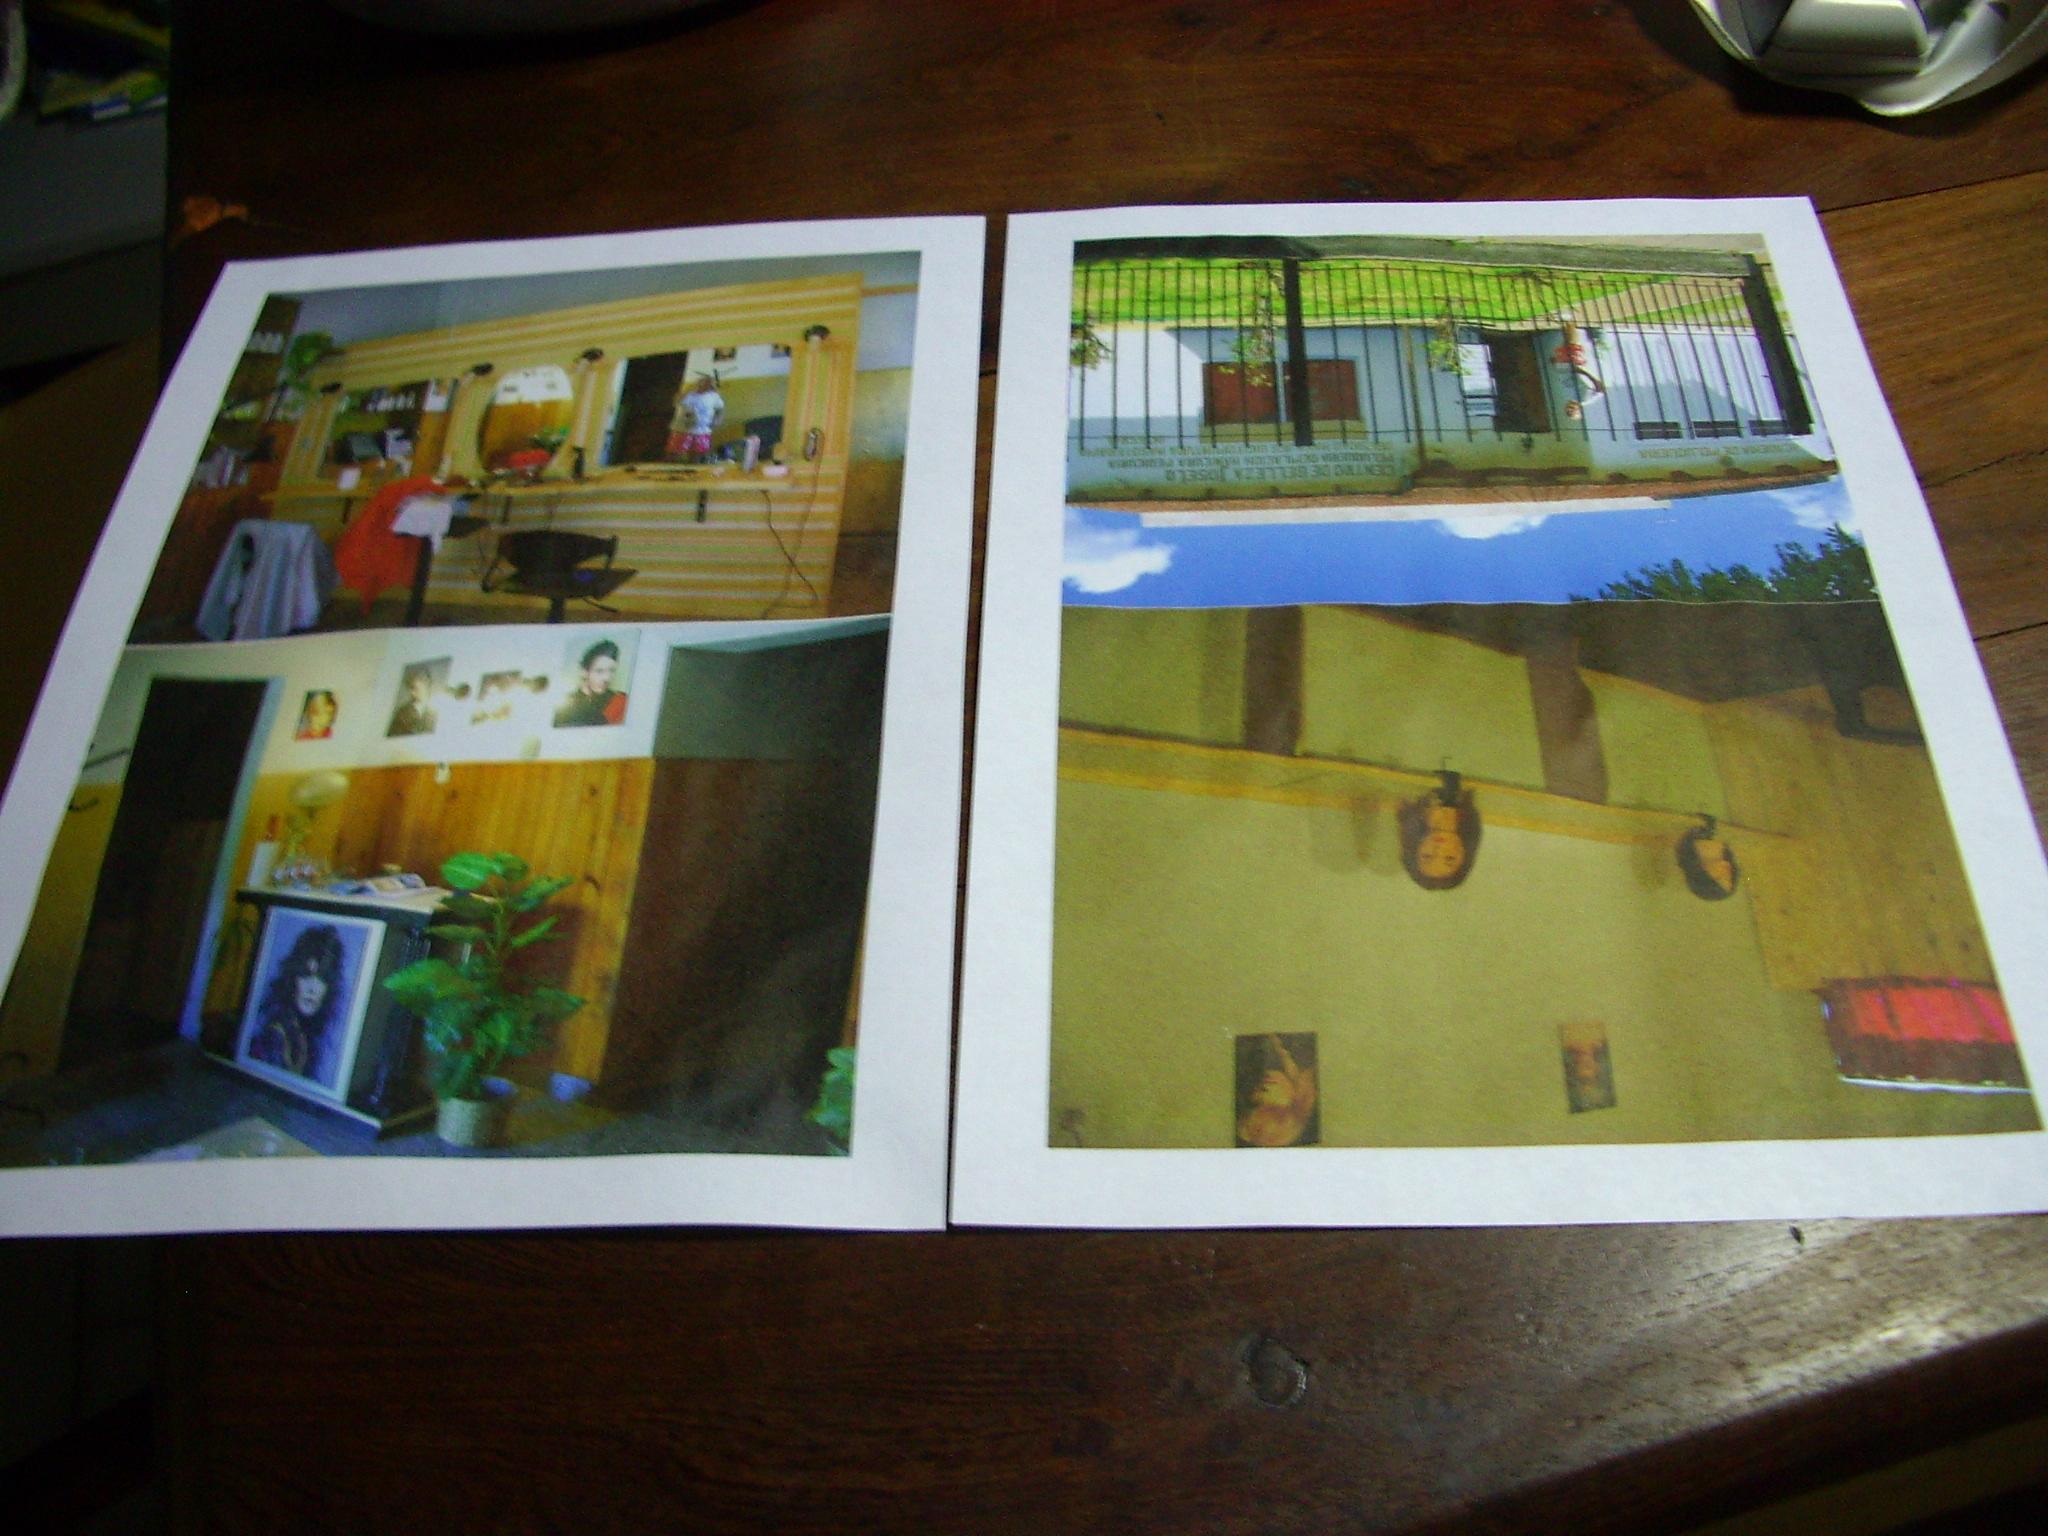 Cheap enhancement of printed photos